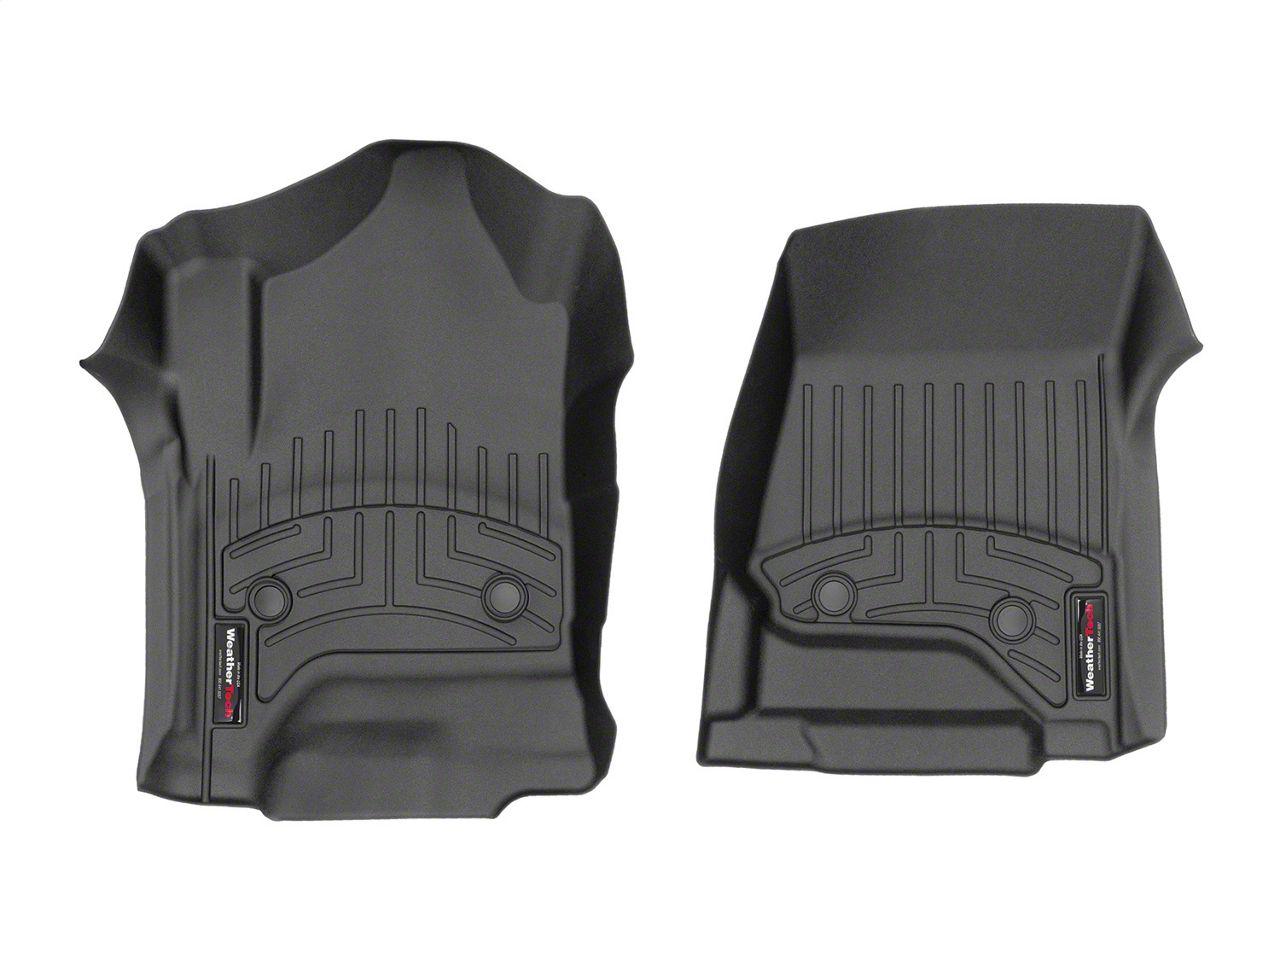 Weathertech DigitalFit Front Floor Liners - Black (14-18 Sierra 1500 Double Cab, Crew Cab w/ Vinyl Floors)